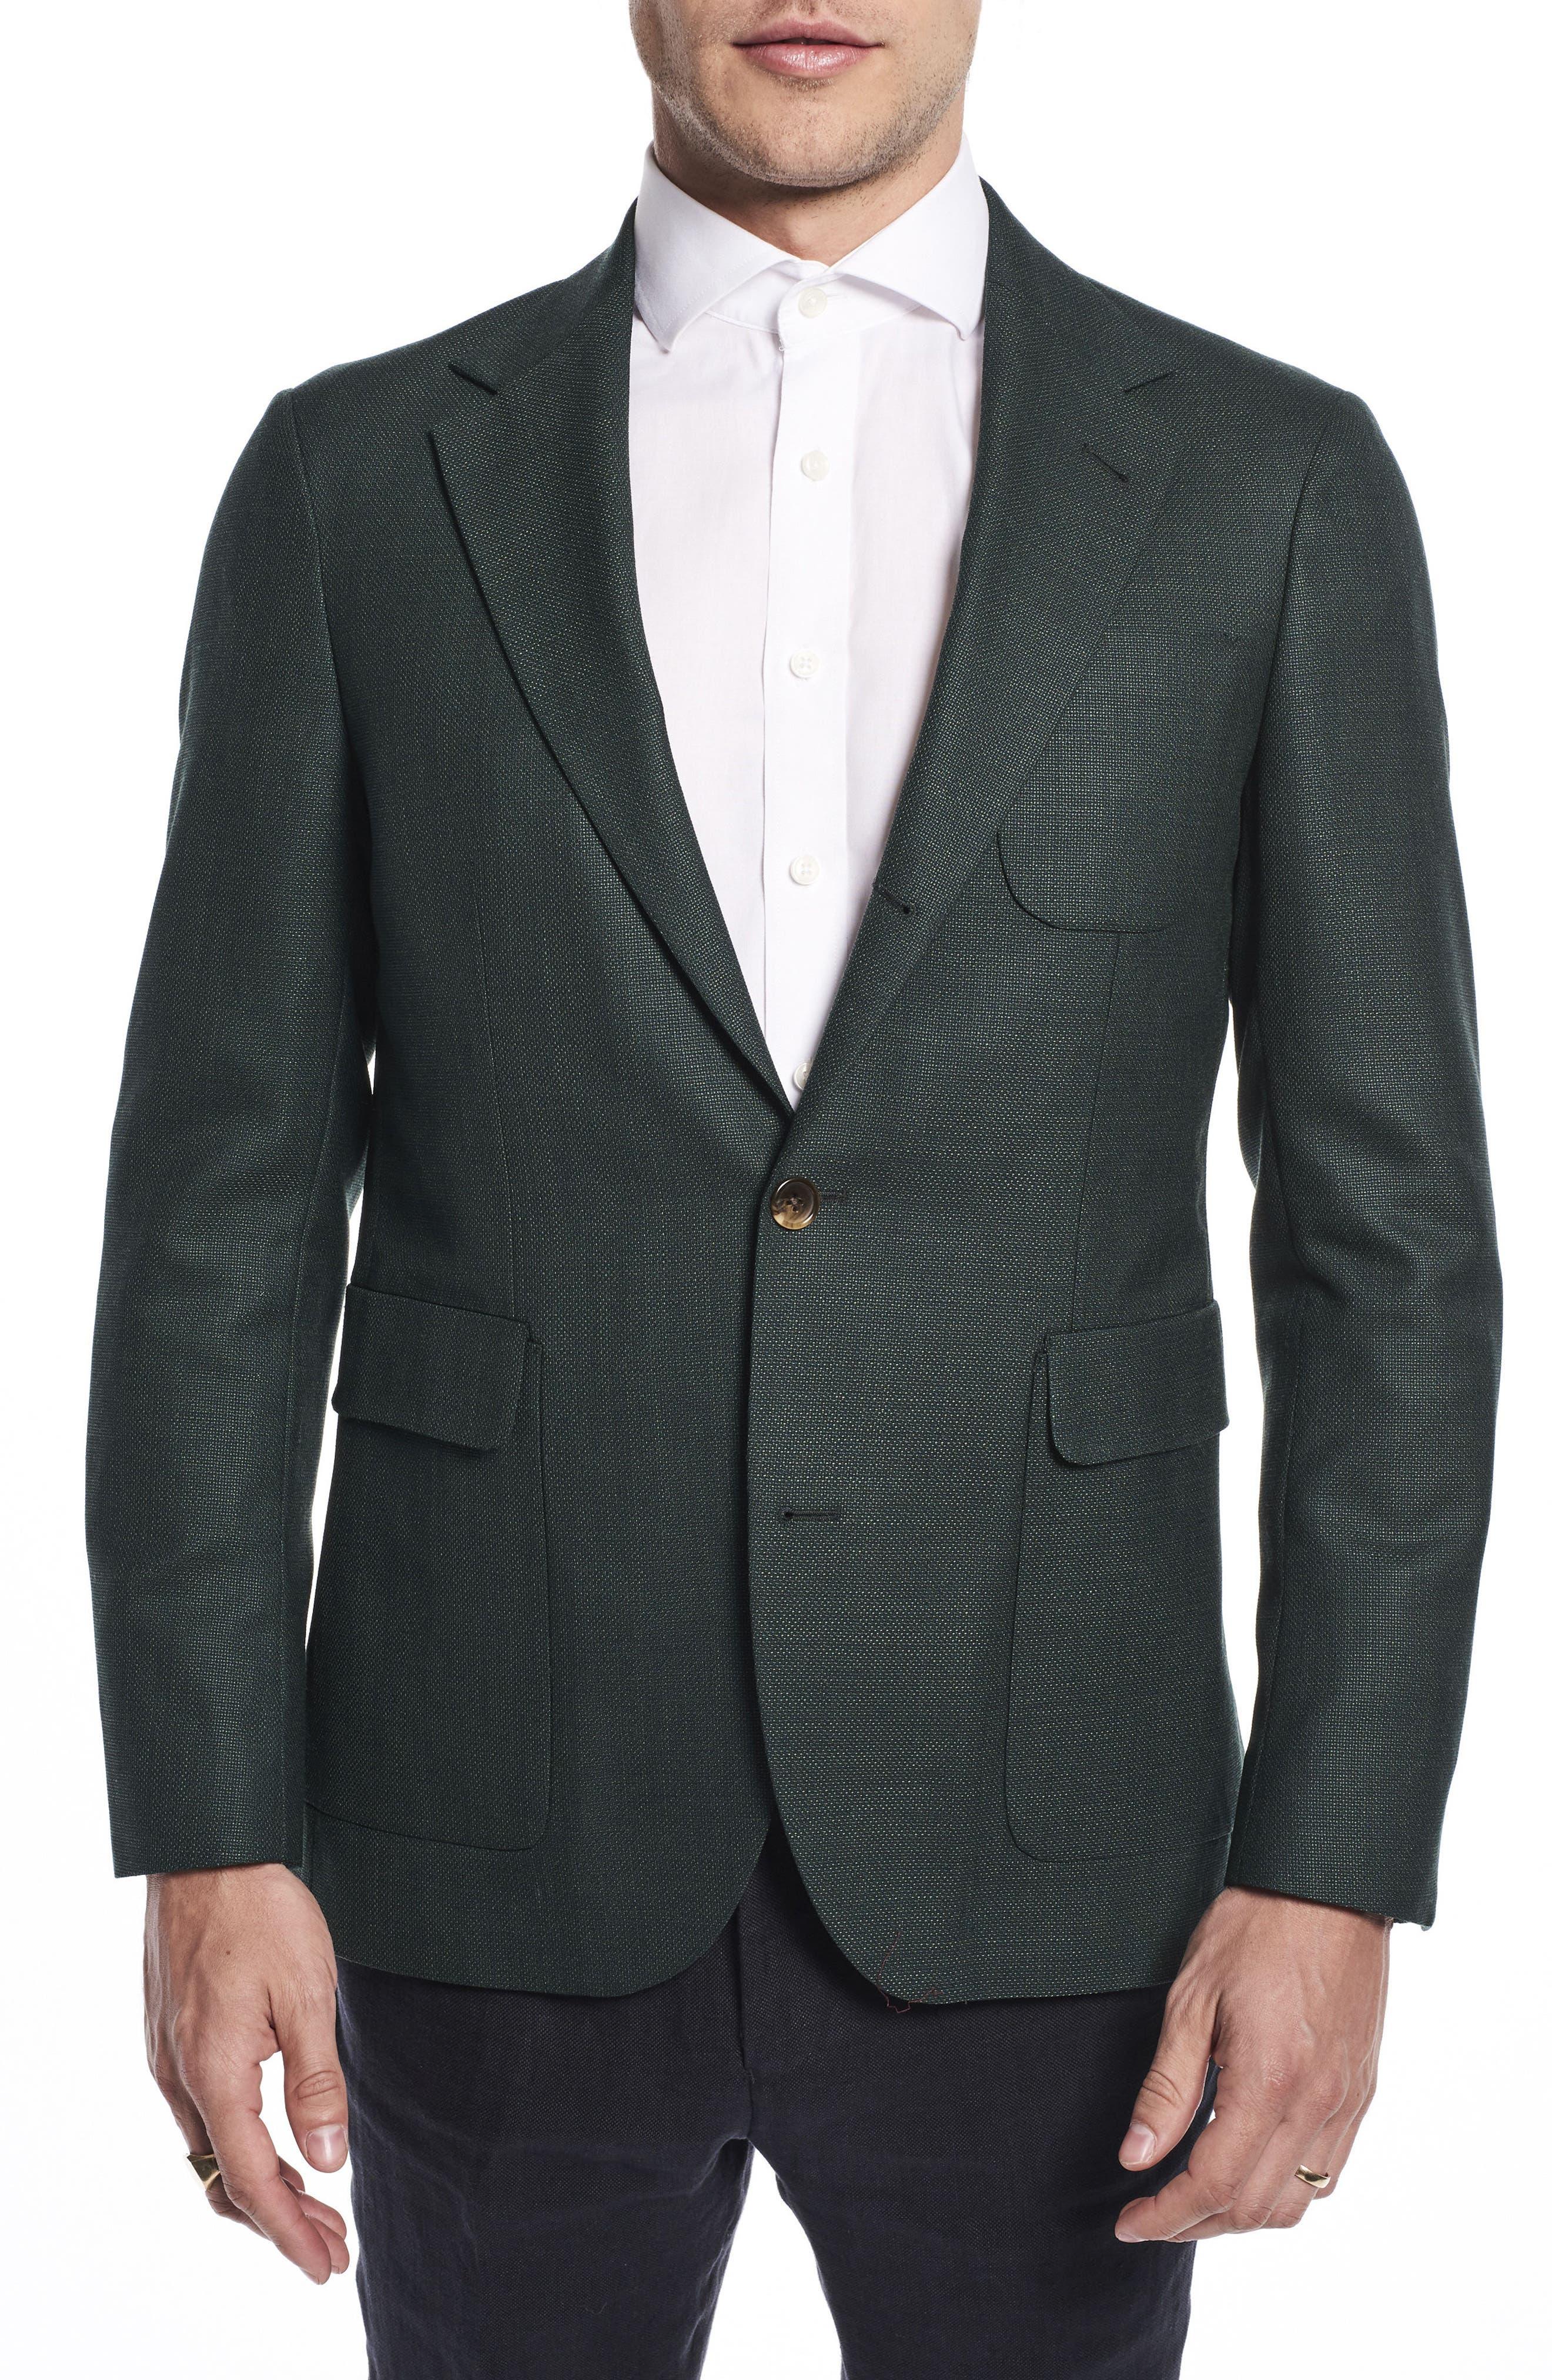 Main Image - Strong Suit by Ilaria Urbinati Ignatius Slim Fit Wool Blazer (Nordstrom Exclusive)